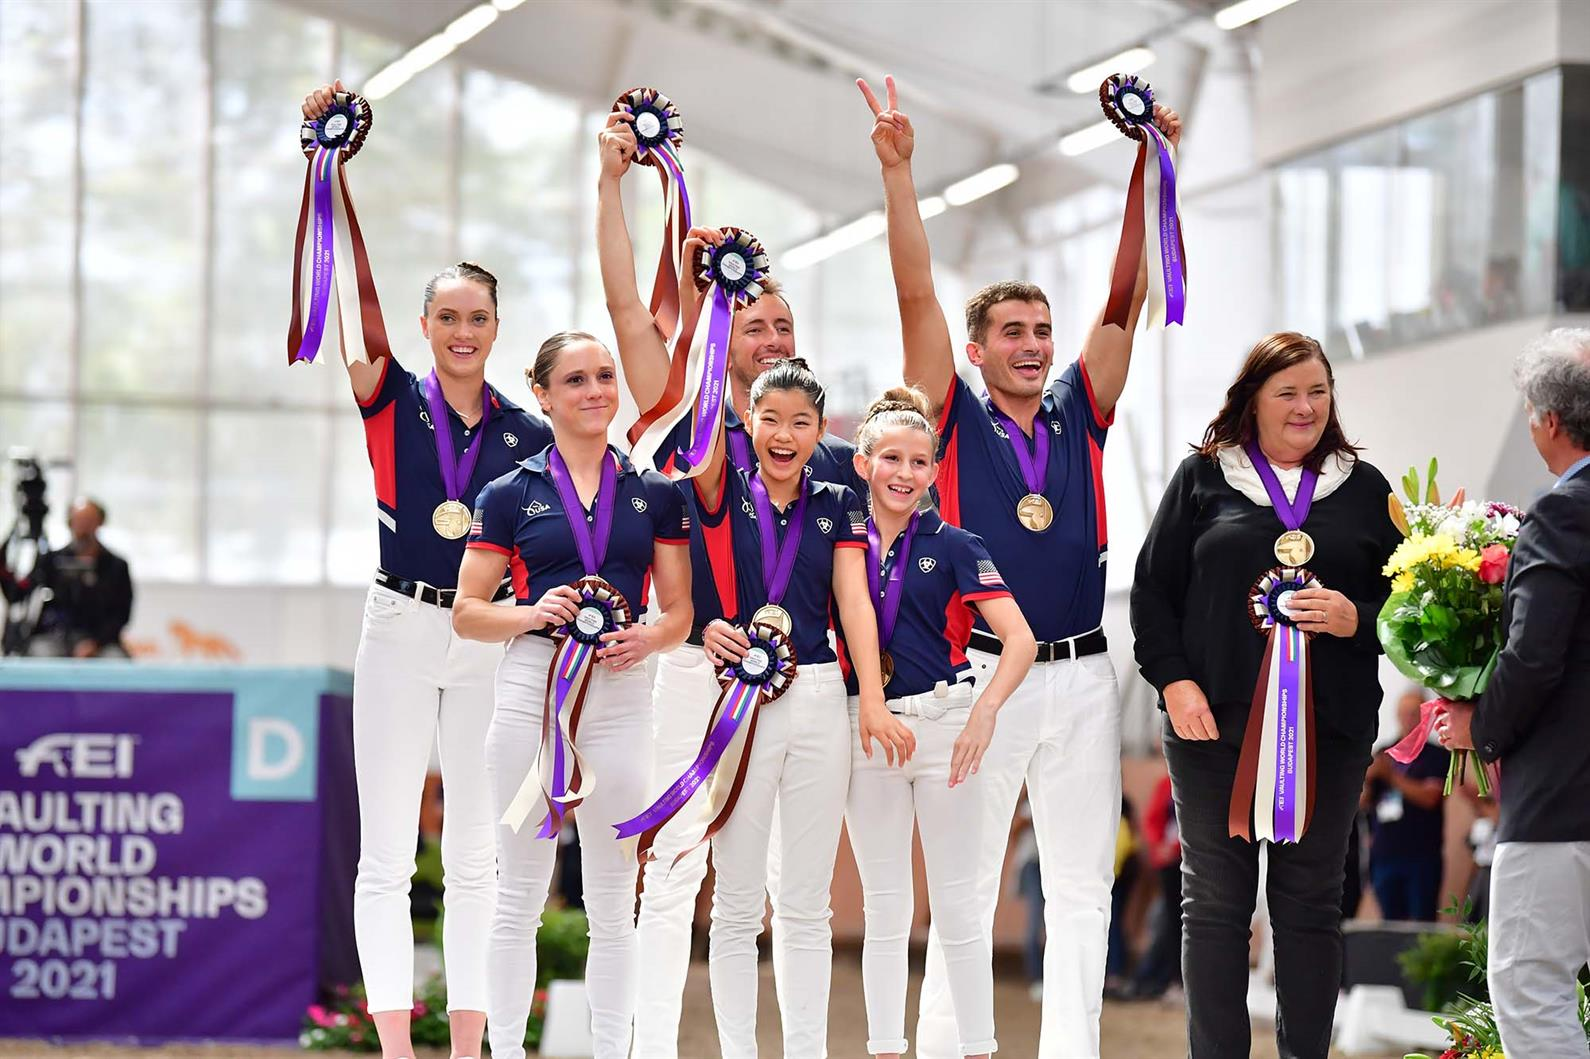 U.S. squad (Pacific Coast Vaulters - front row: Emily Rose, Emi Yang, Hannah Wildermuth, back row: Haley Smith, Geoffrey Woolson, Daniel Janes, longeur Carolyn Bland), team bronze medalists